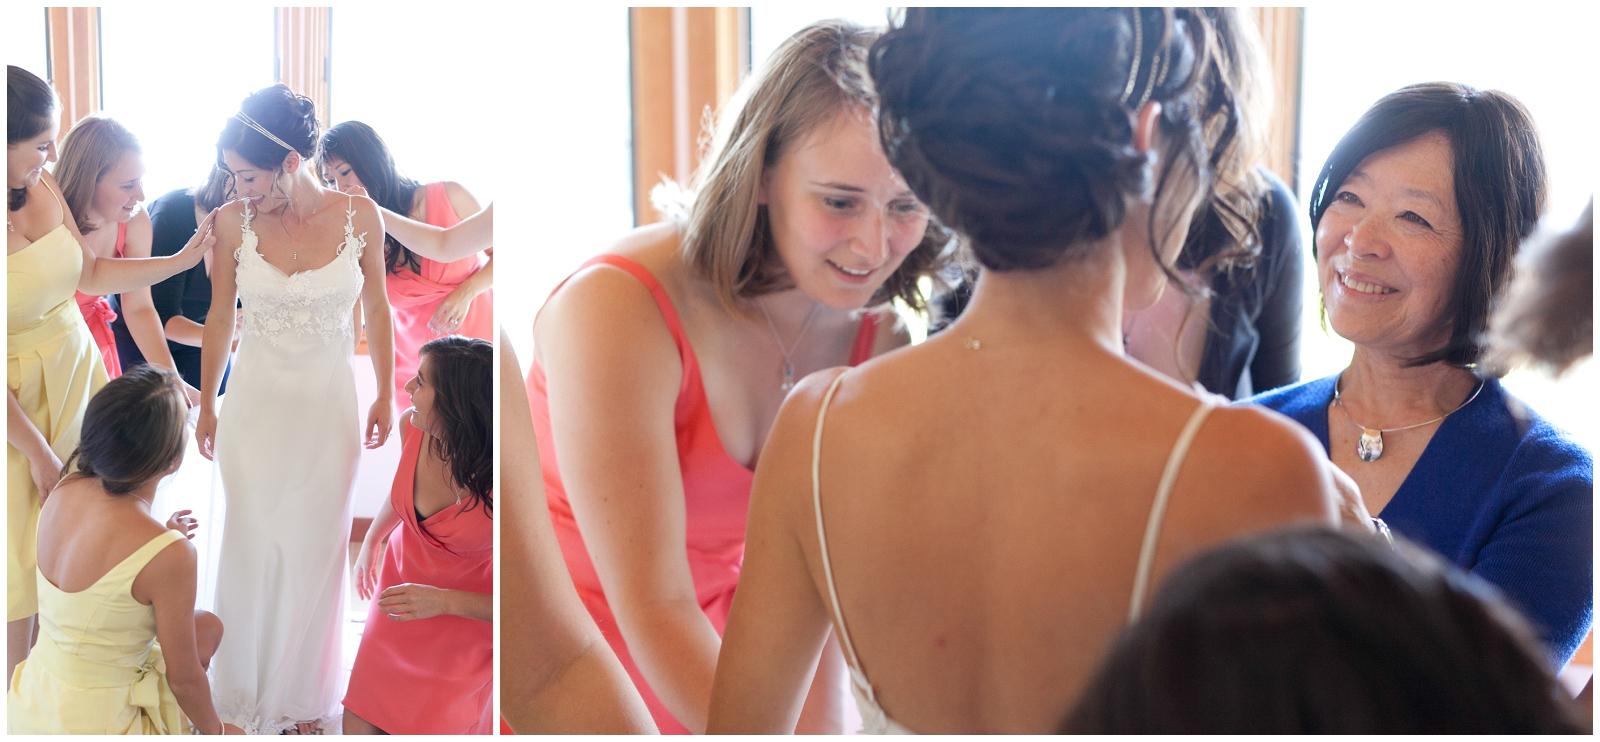 San-Francisco-Bay-Area-Wedding-Photography-Brazilian-Room-3.jpg